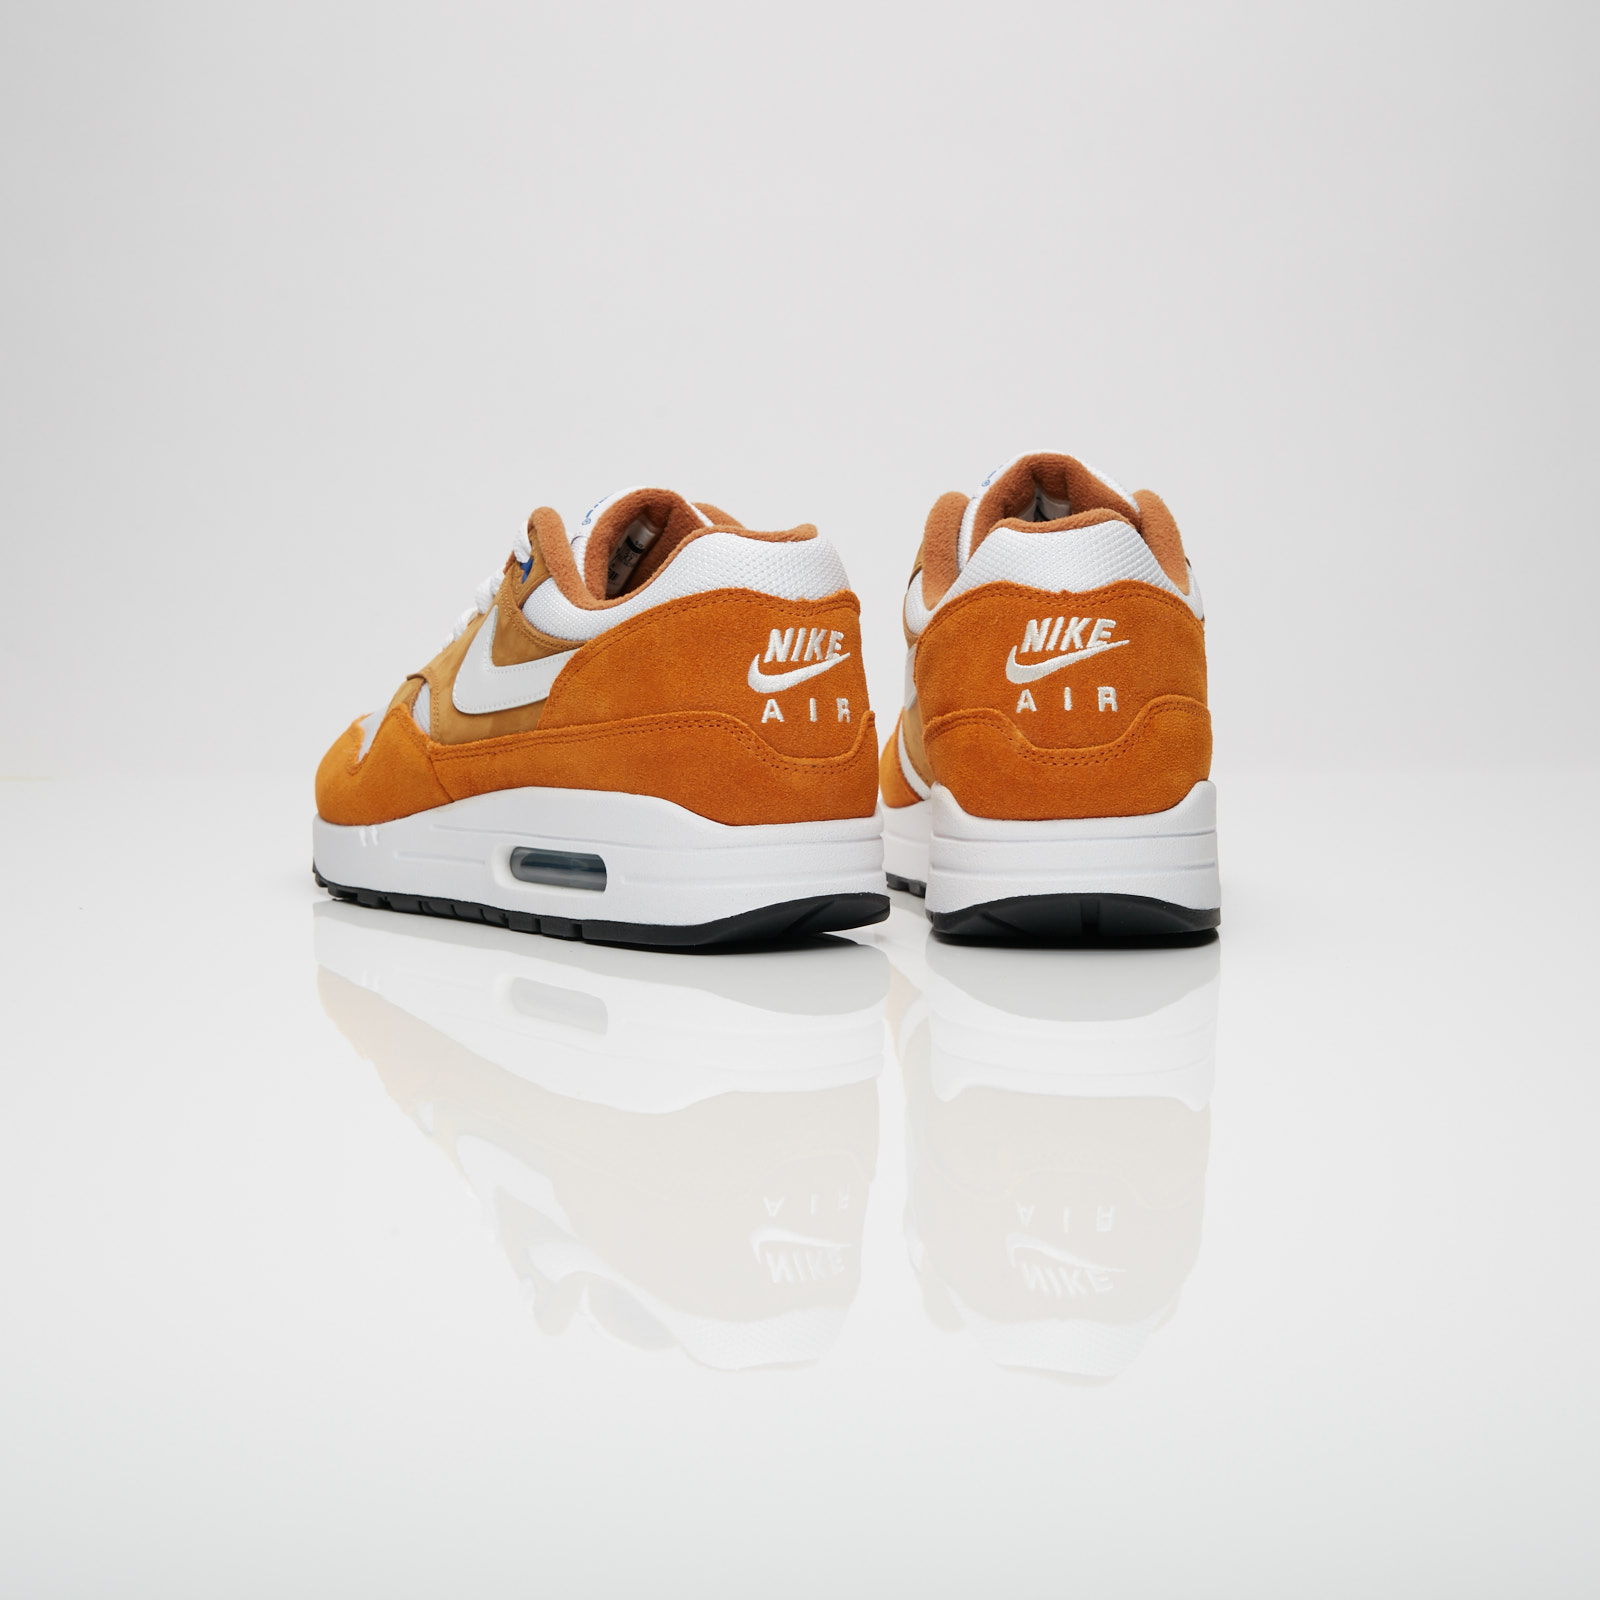 676dbfa6dc01d Nike Air Max 1 Premium Retro - 908366-700 - Sneakersnstuff ...